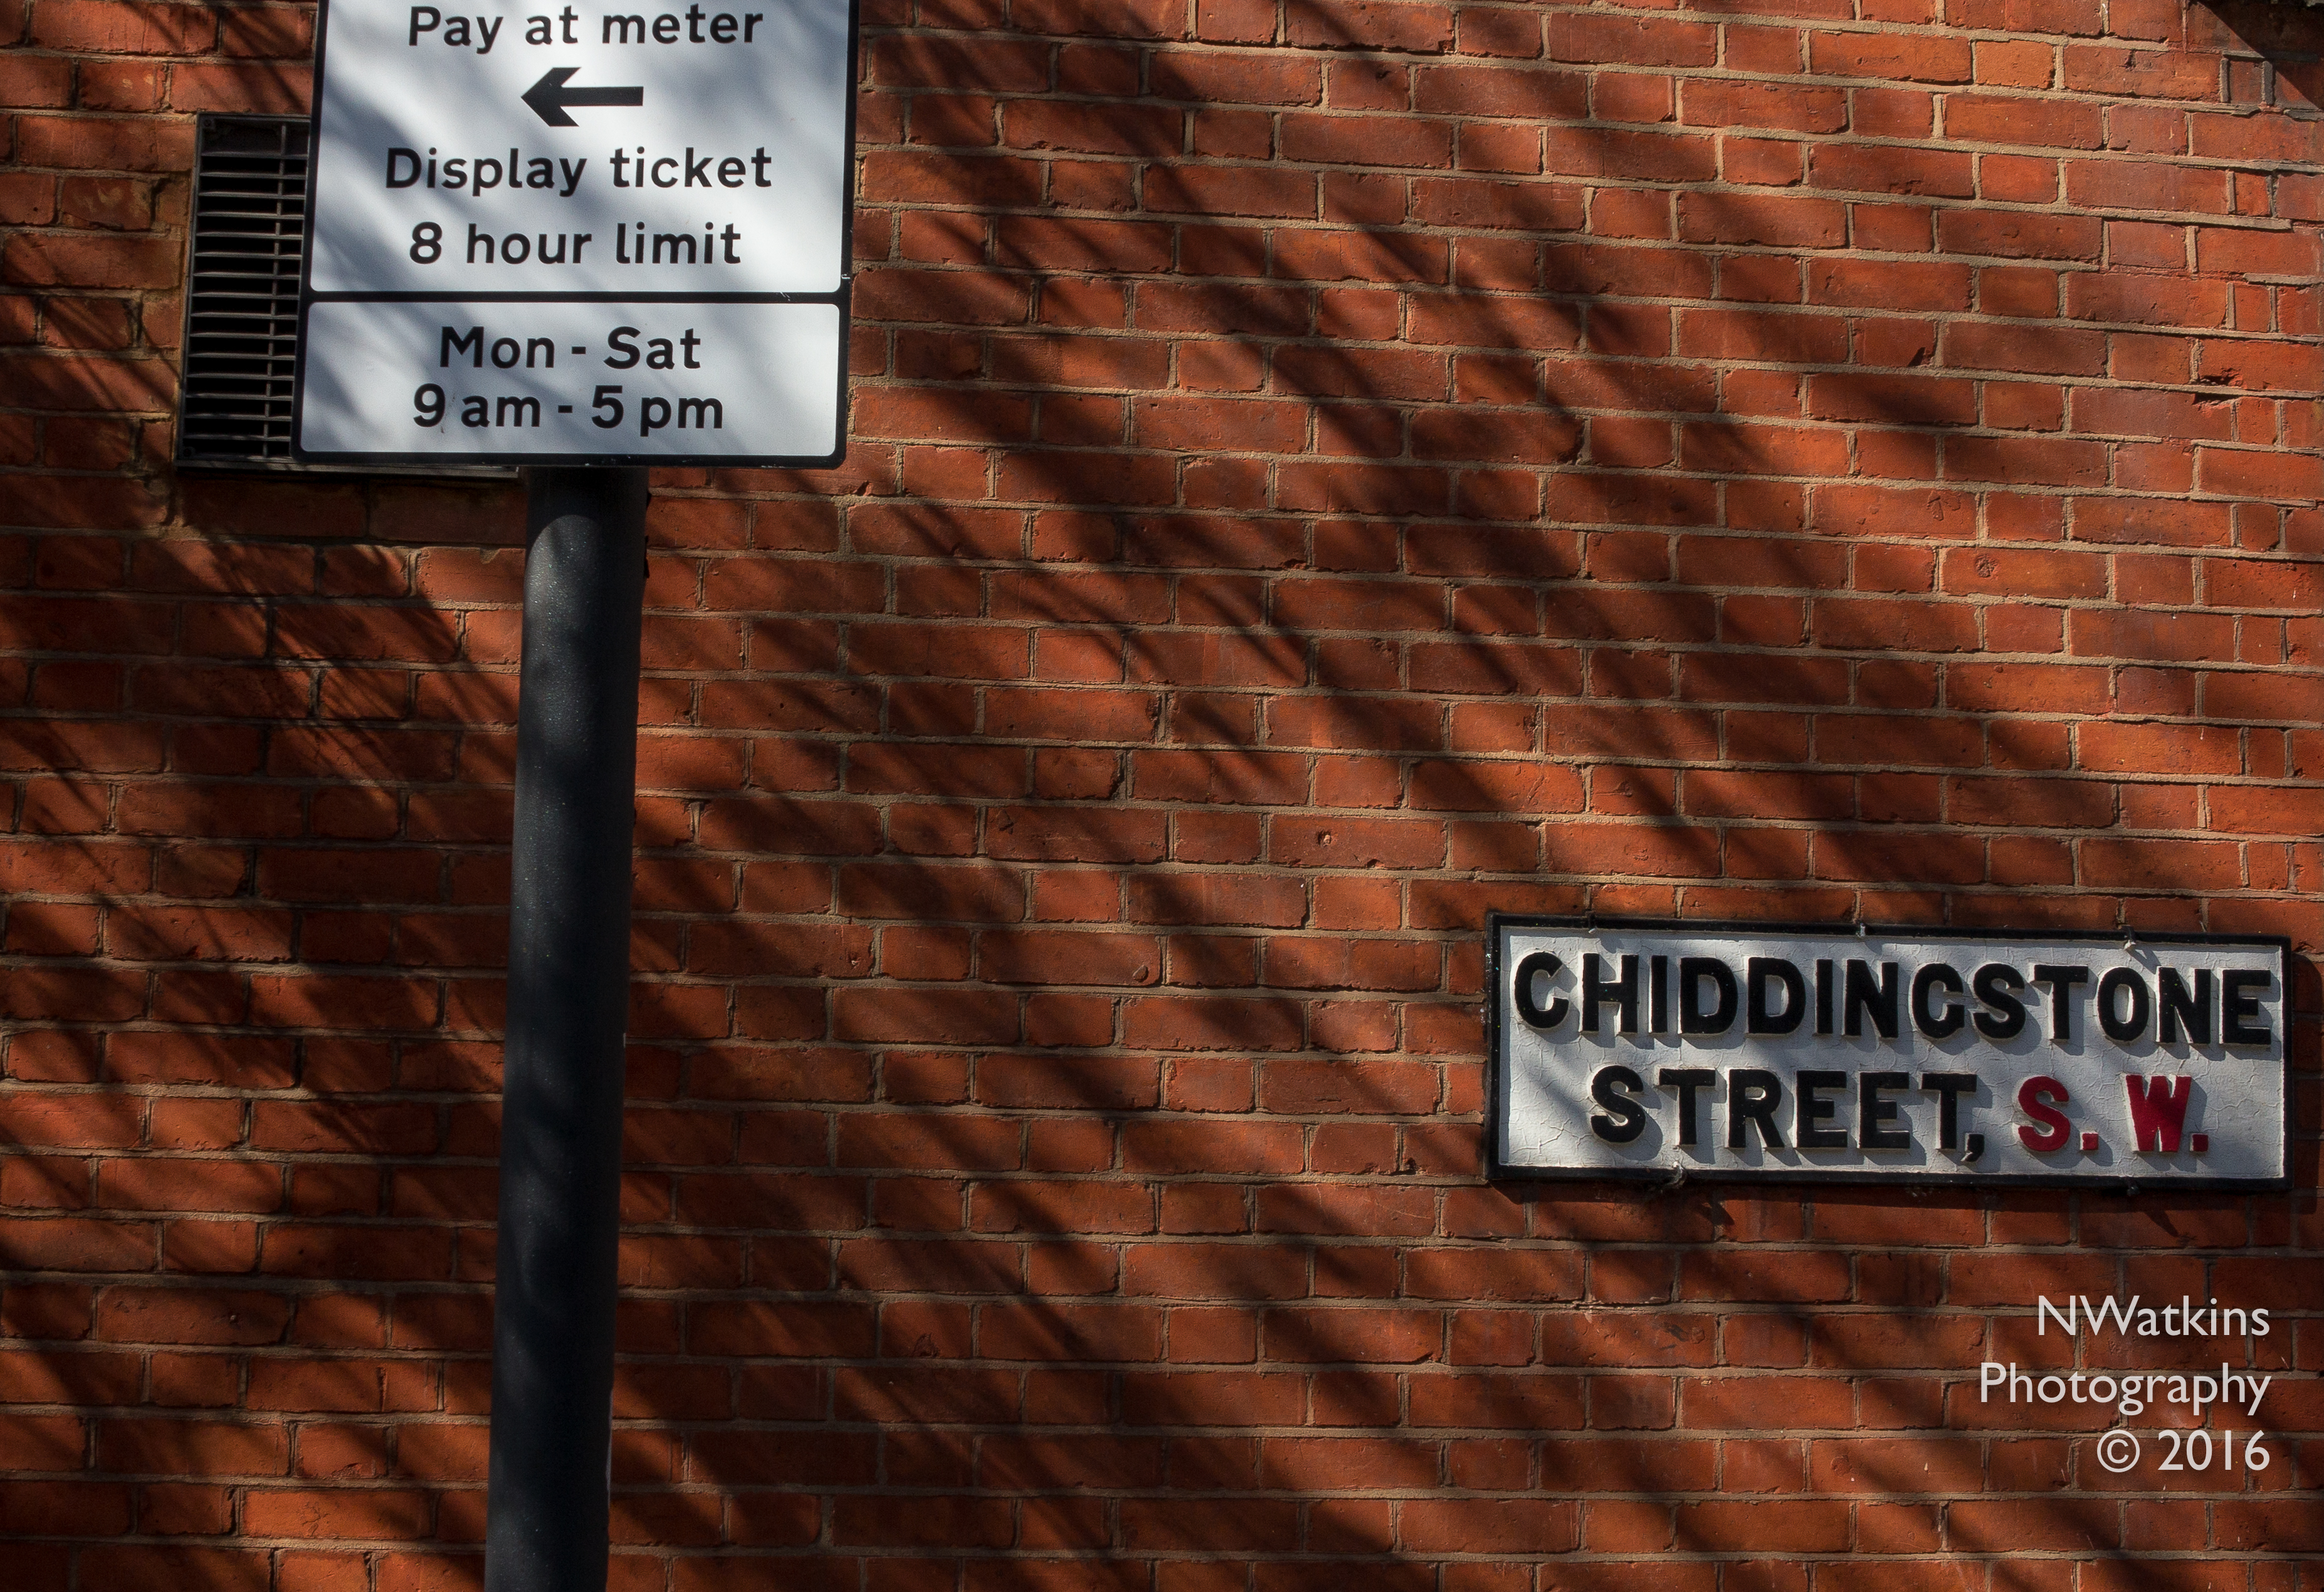 w1-daytime parking on chiddingstone street cw